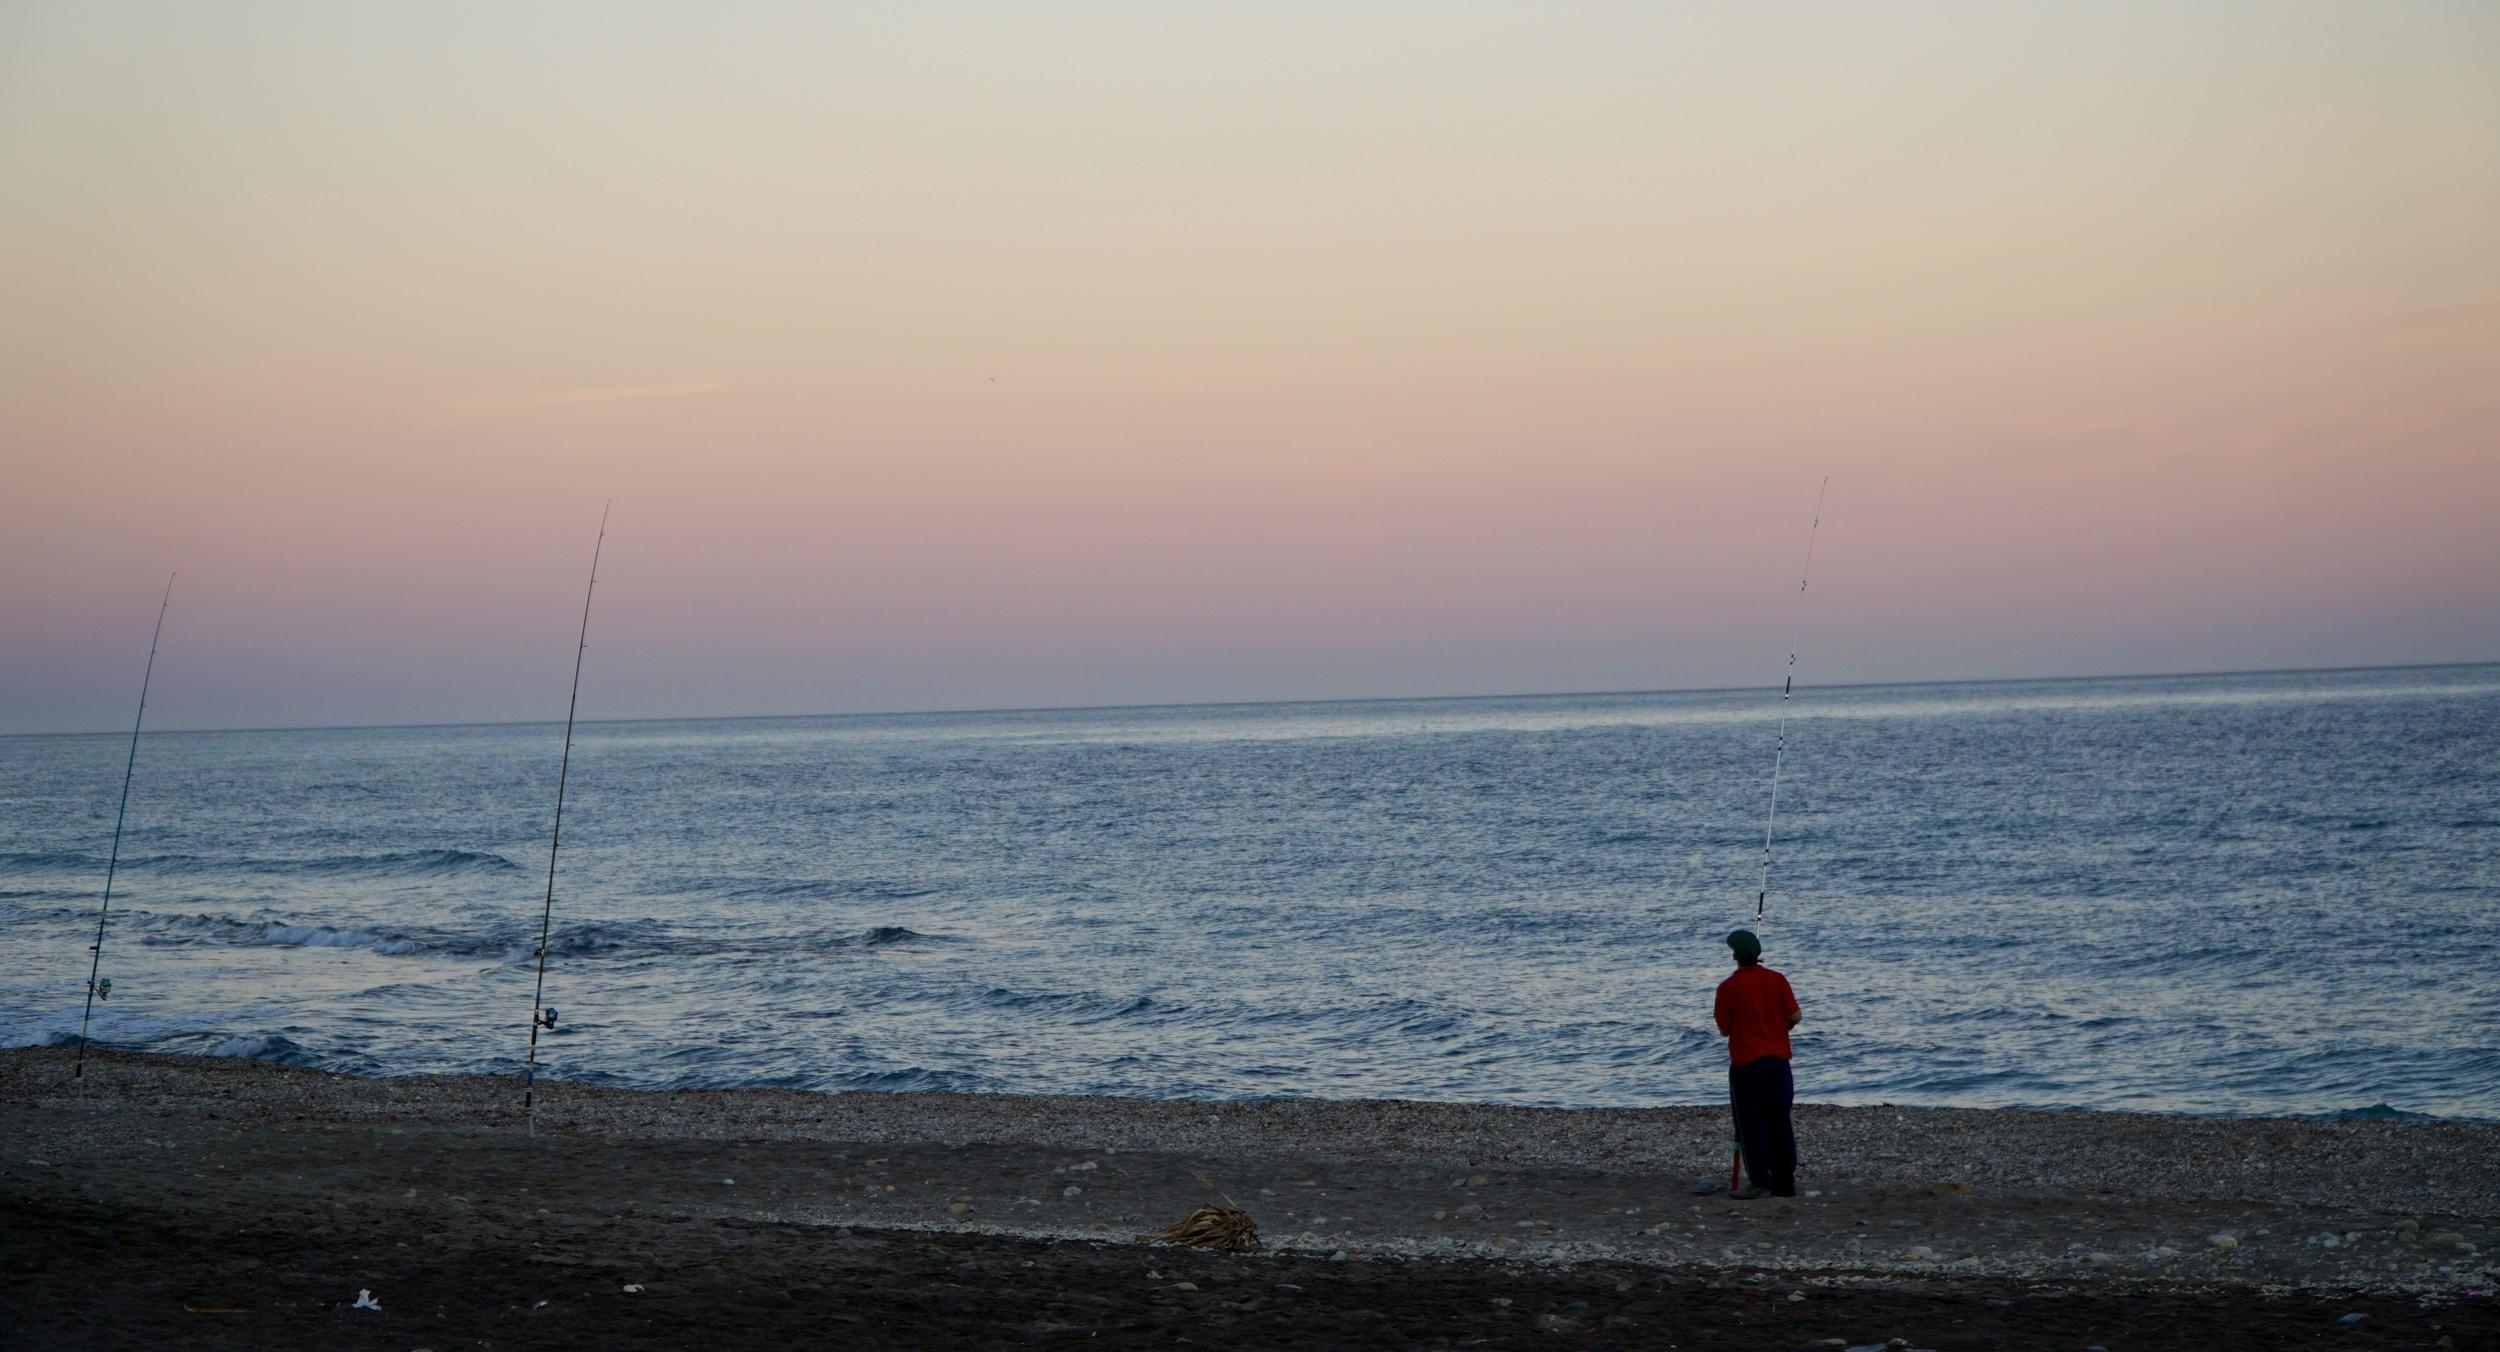 Mojacar beach and its fishermen